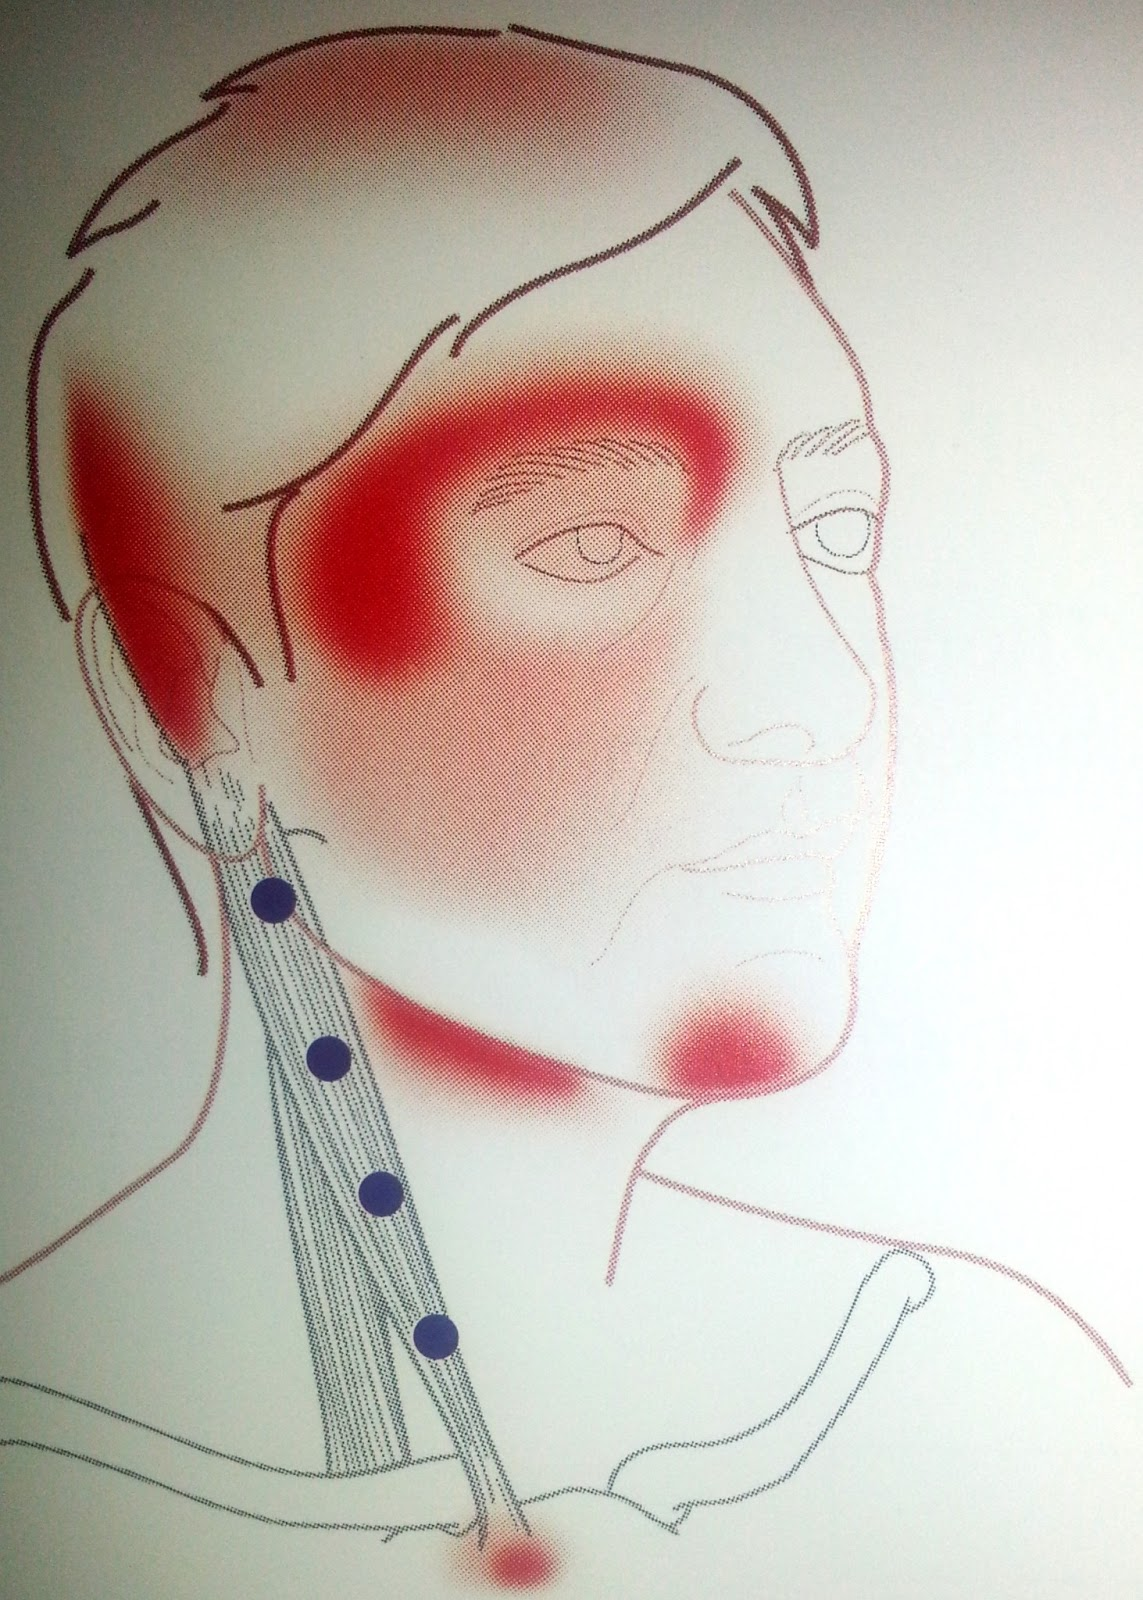 fibromyalgia pain diagram onan generator remote start stop switch wiring paul skidmore therapies